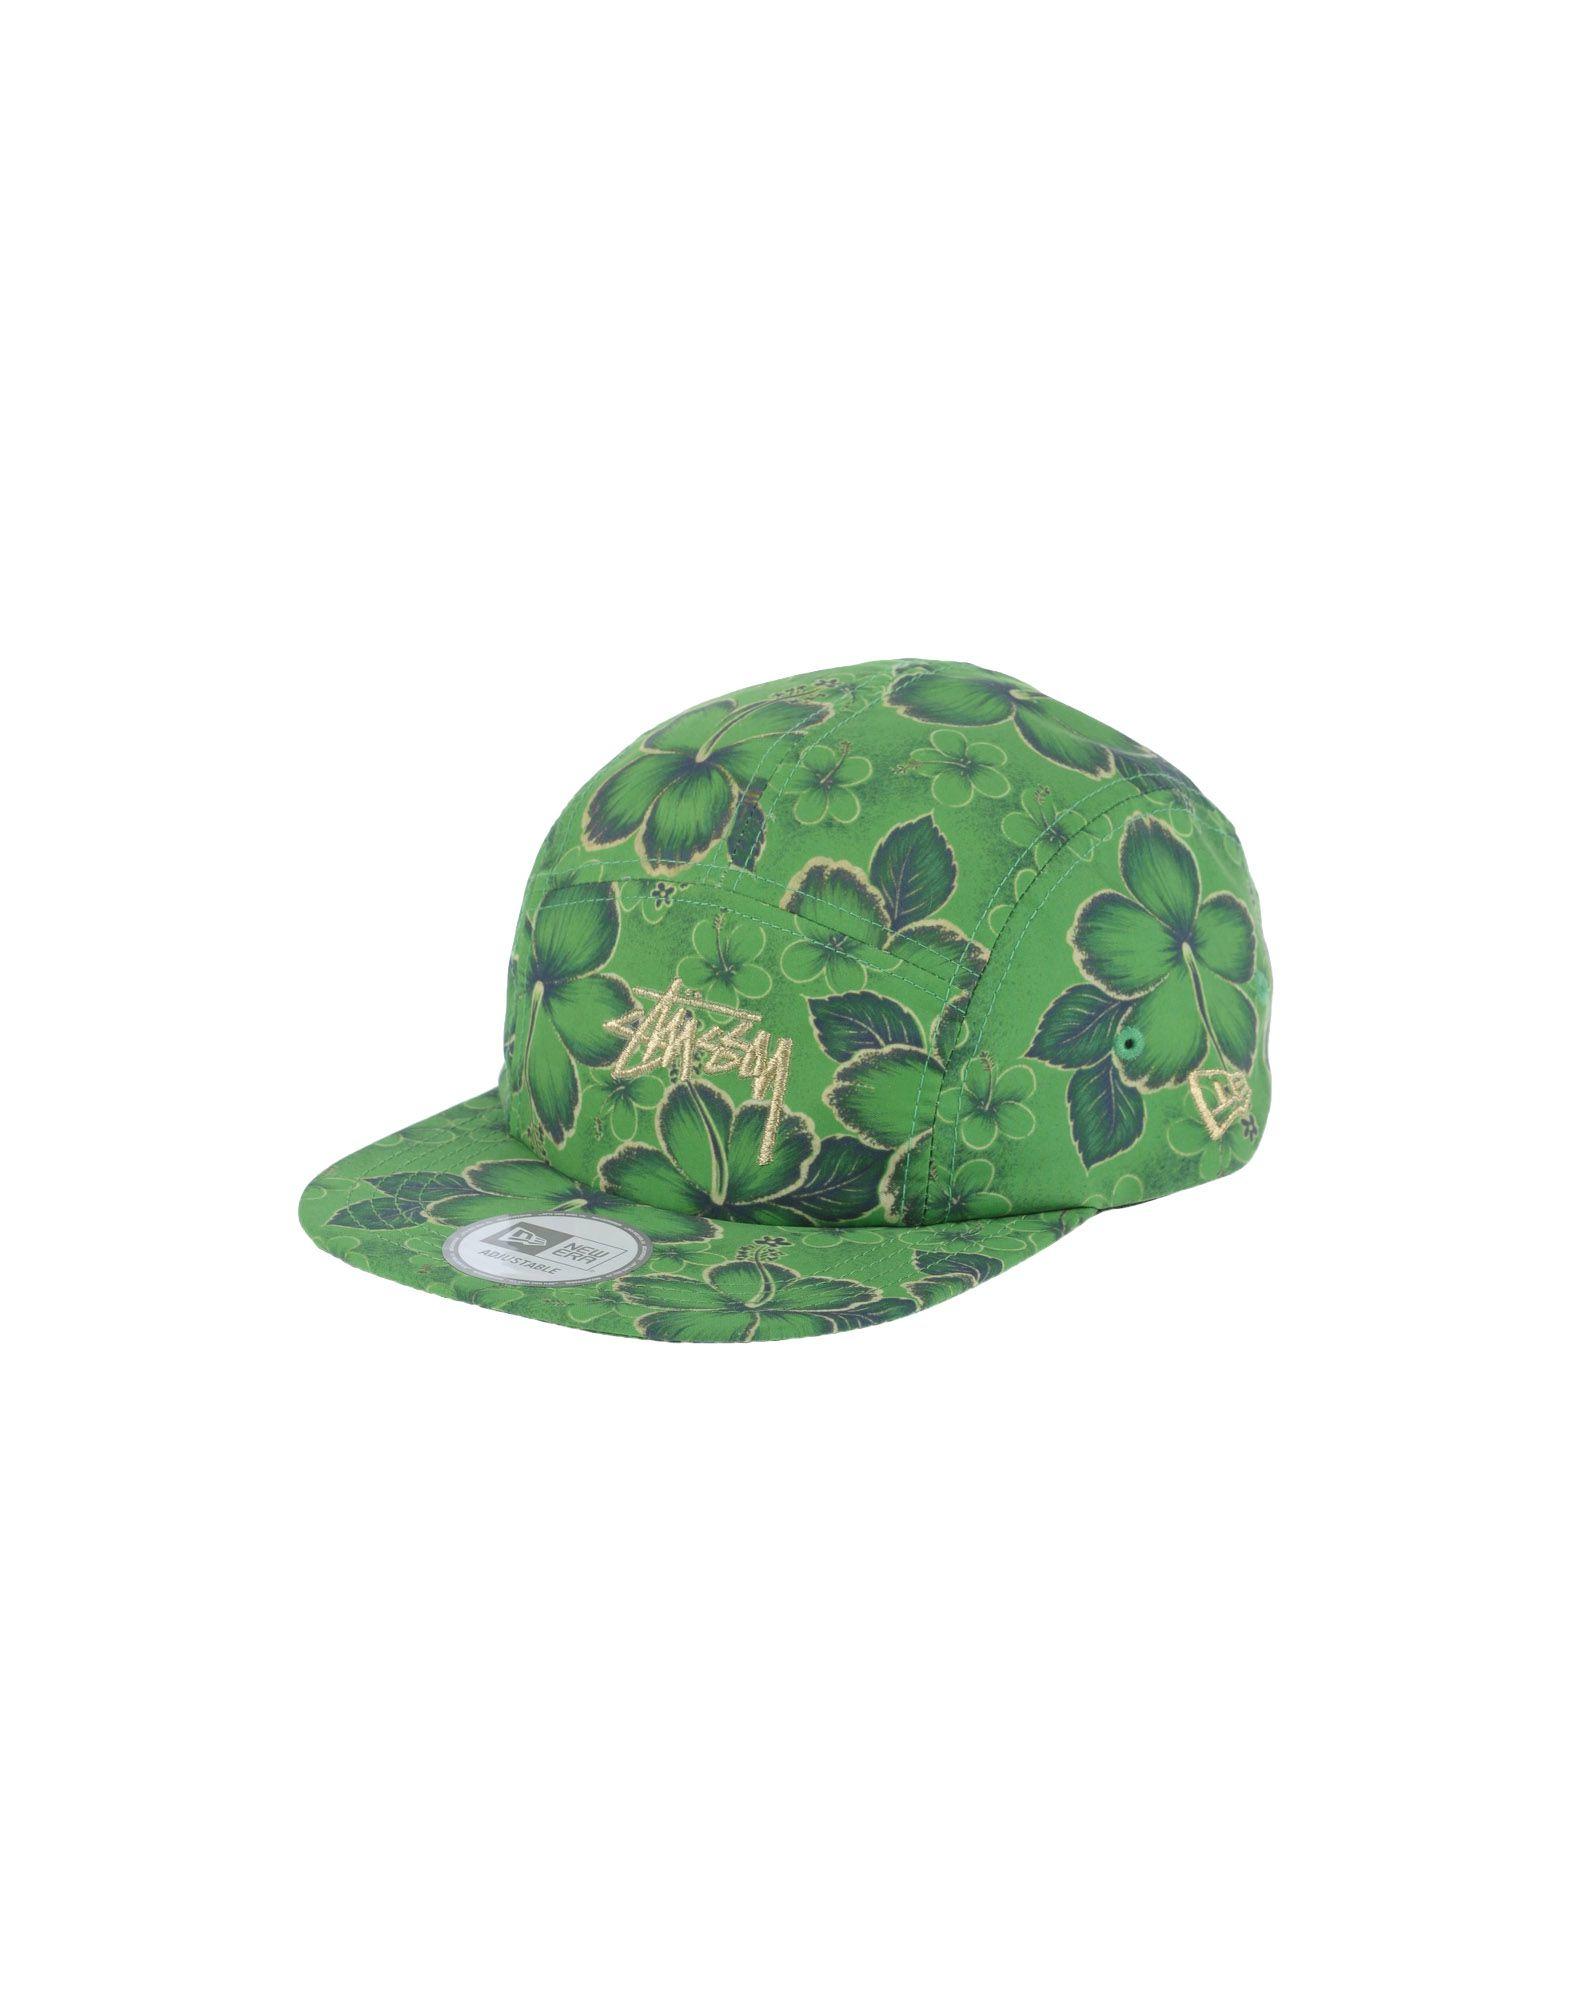 Stussy Hat In Green